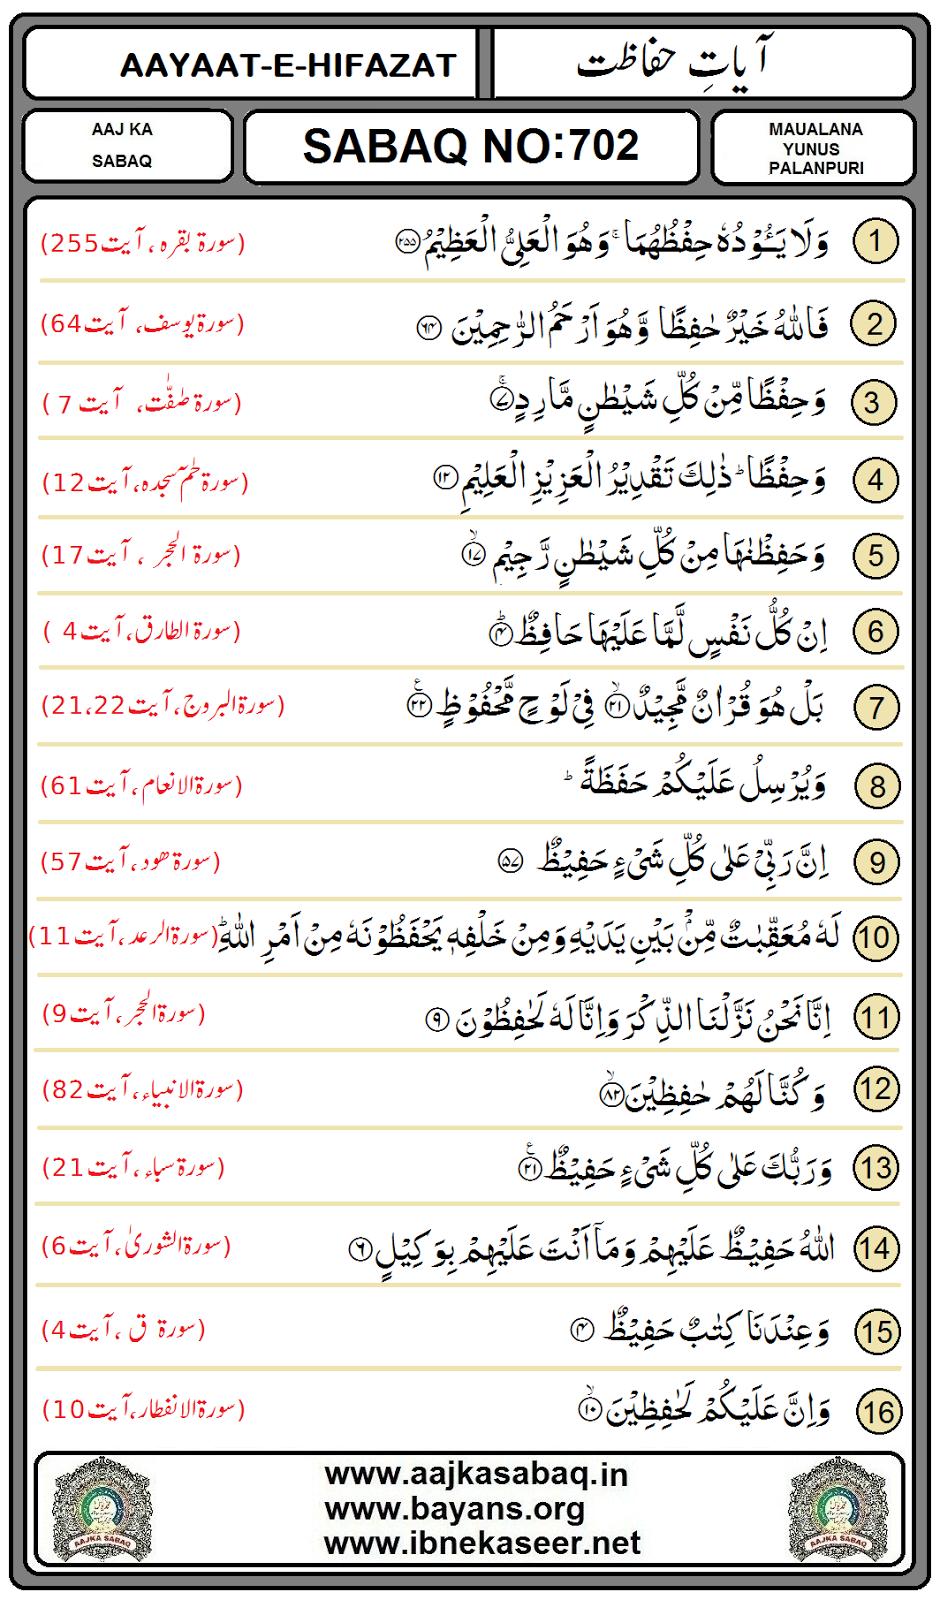 Aayat E Hifazat 2 Png 940 1600 Learn Quran Islamic Inspirational Quotes Islamic Phrases